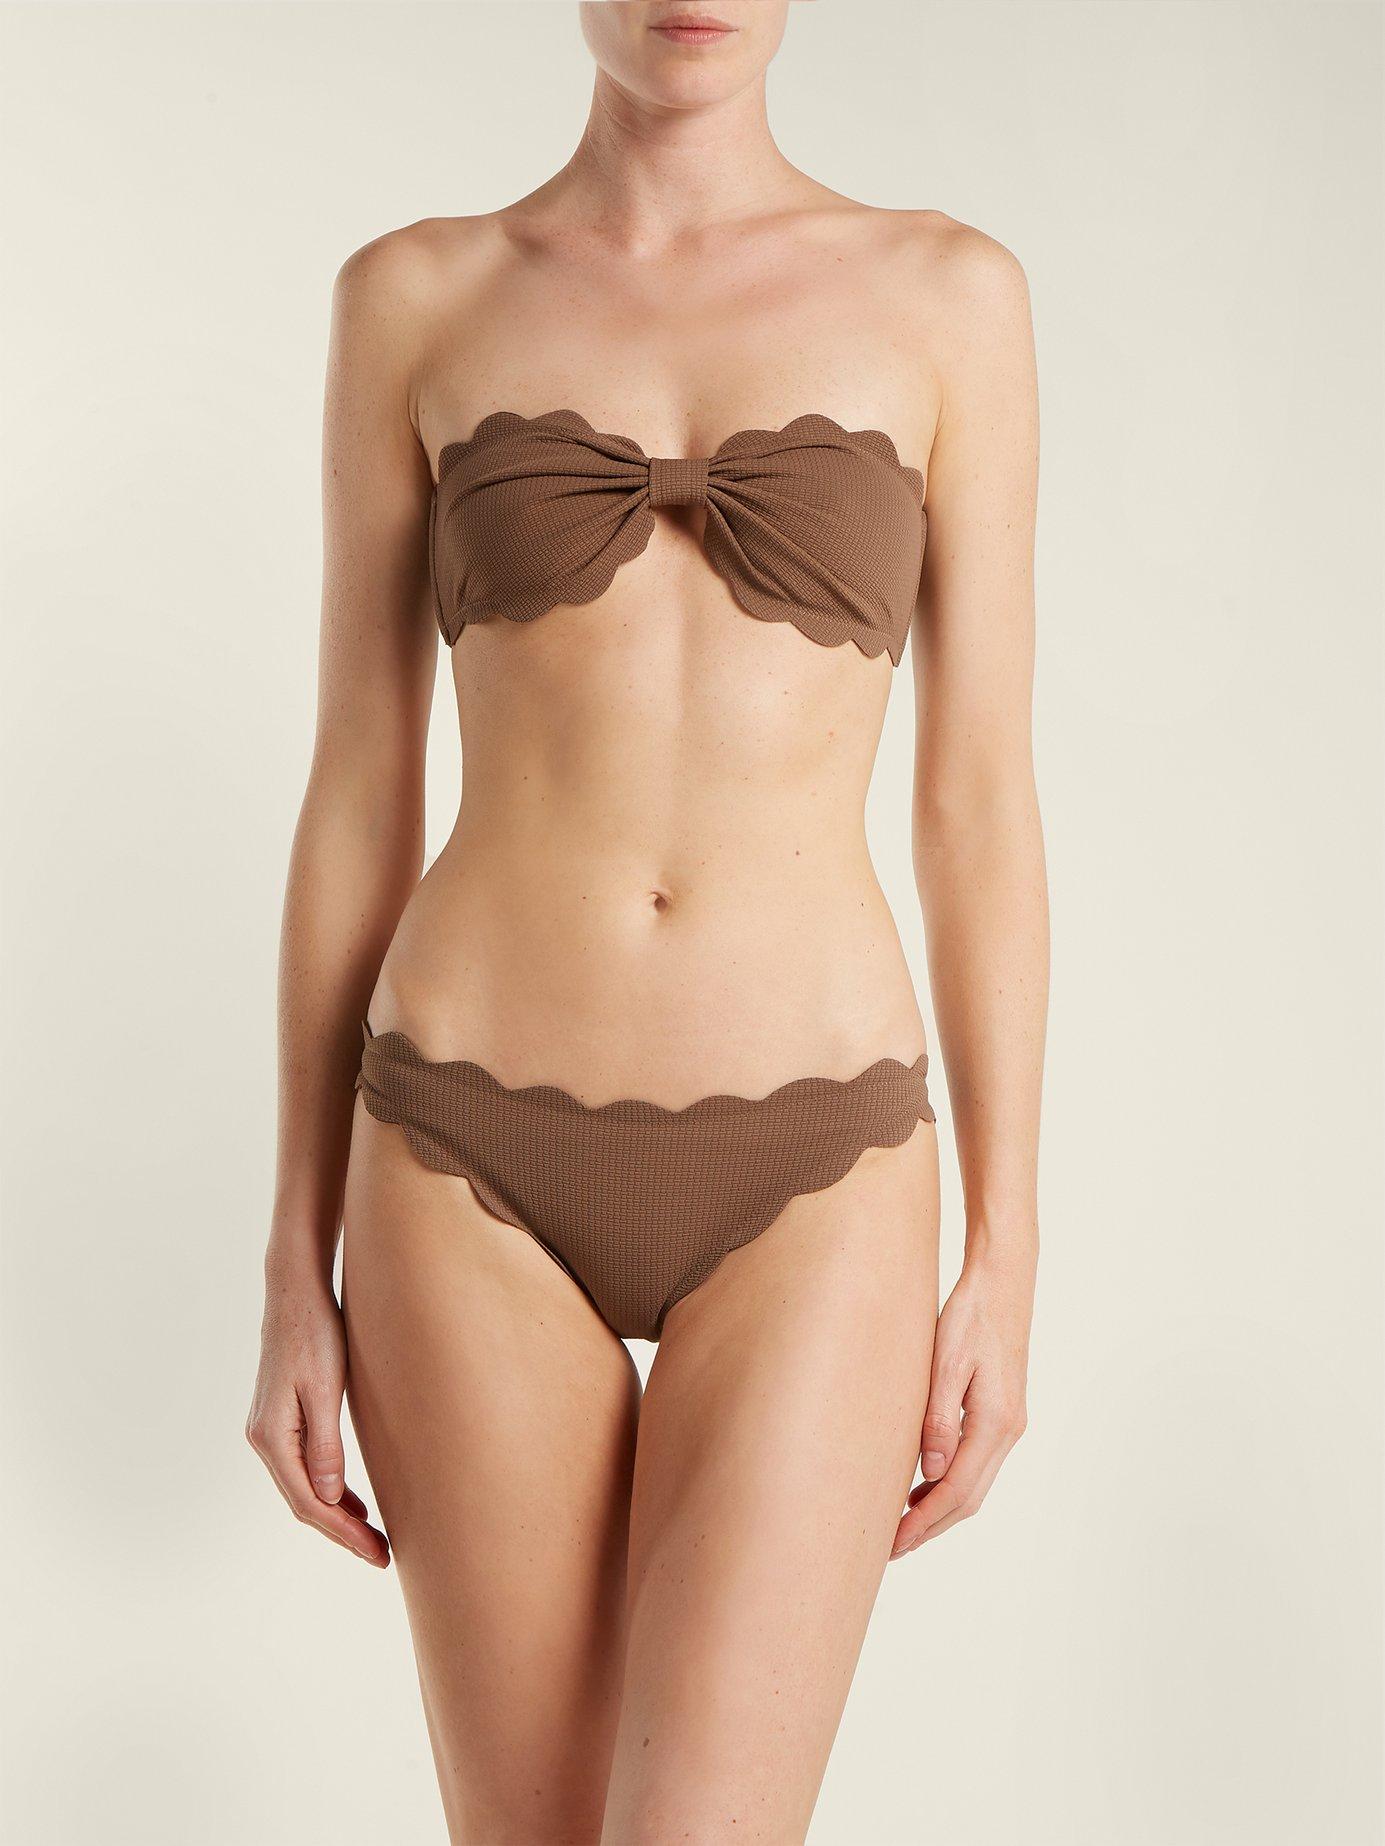 Antibes scalloped-edge bikini briefs by Marysia